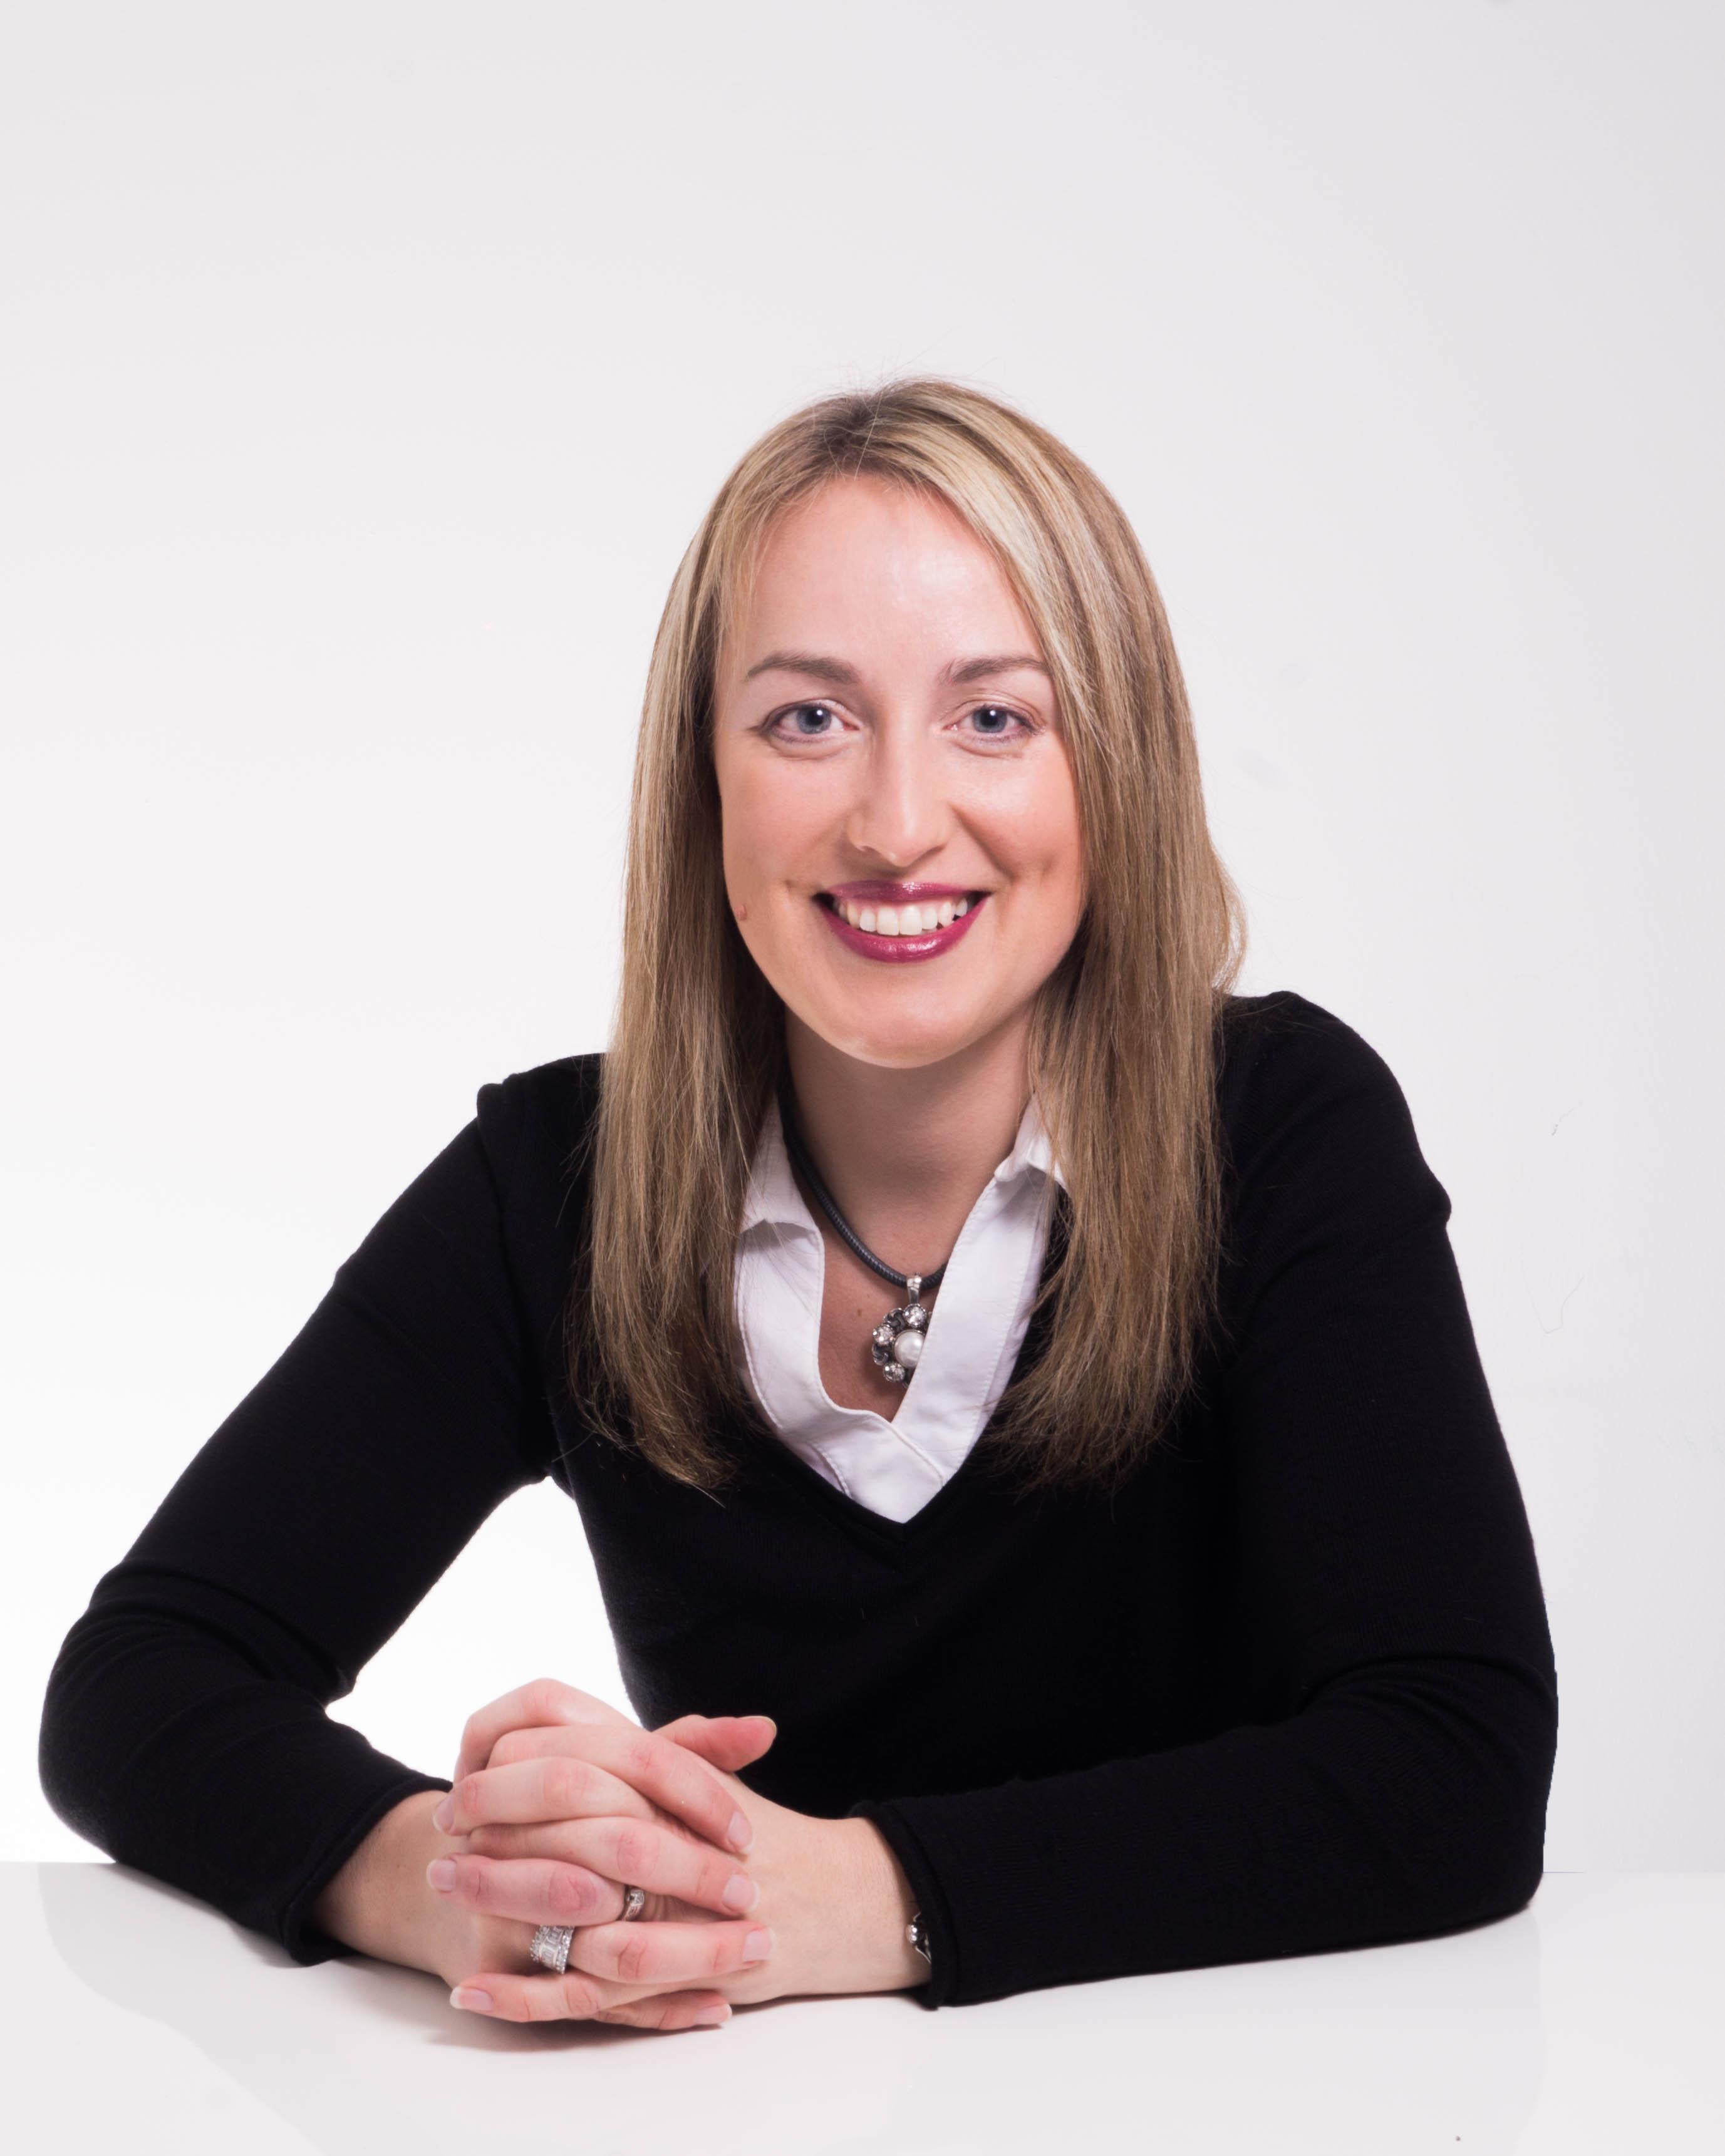 FlowForma - Olivia Bushe, Chief Marketing Officer and No Code BPM expert